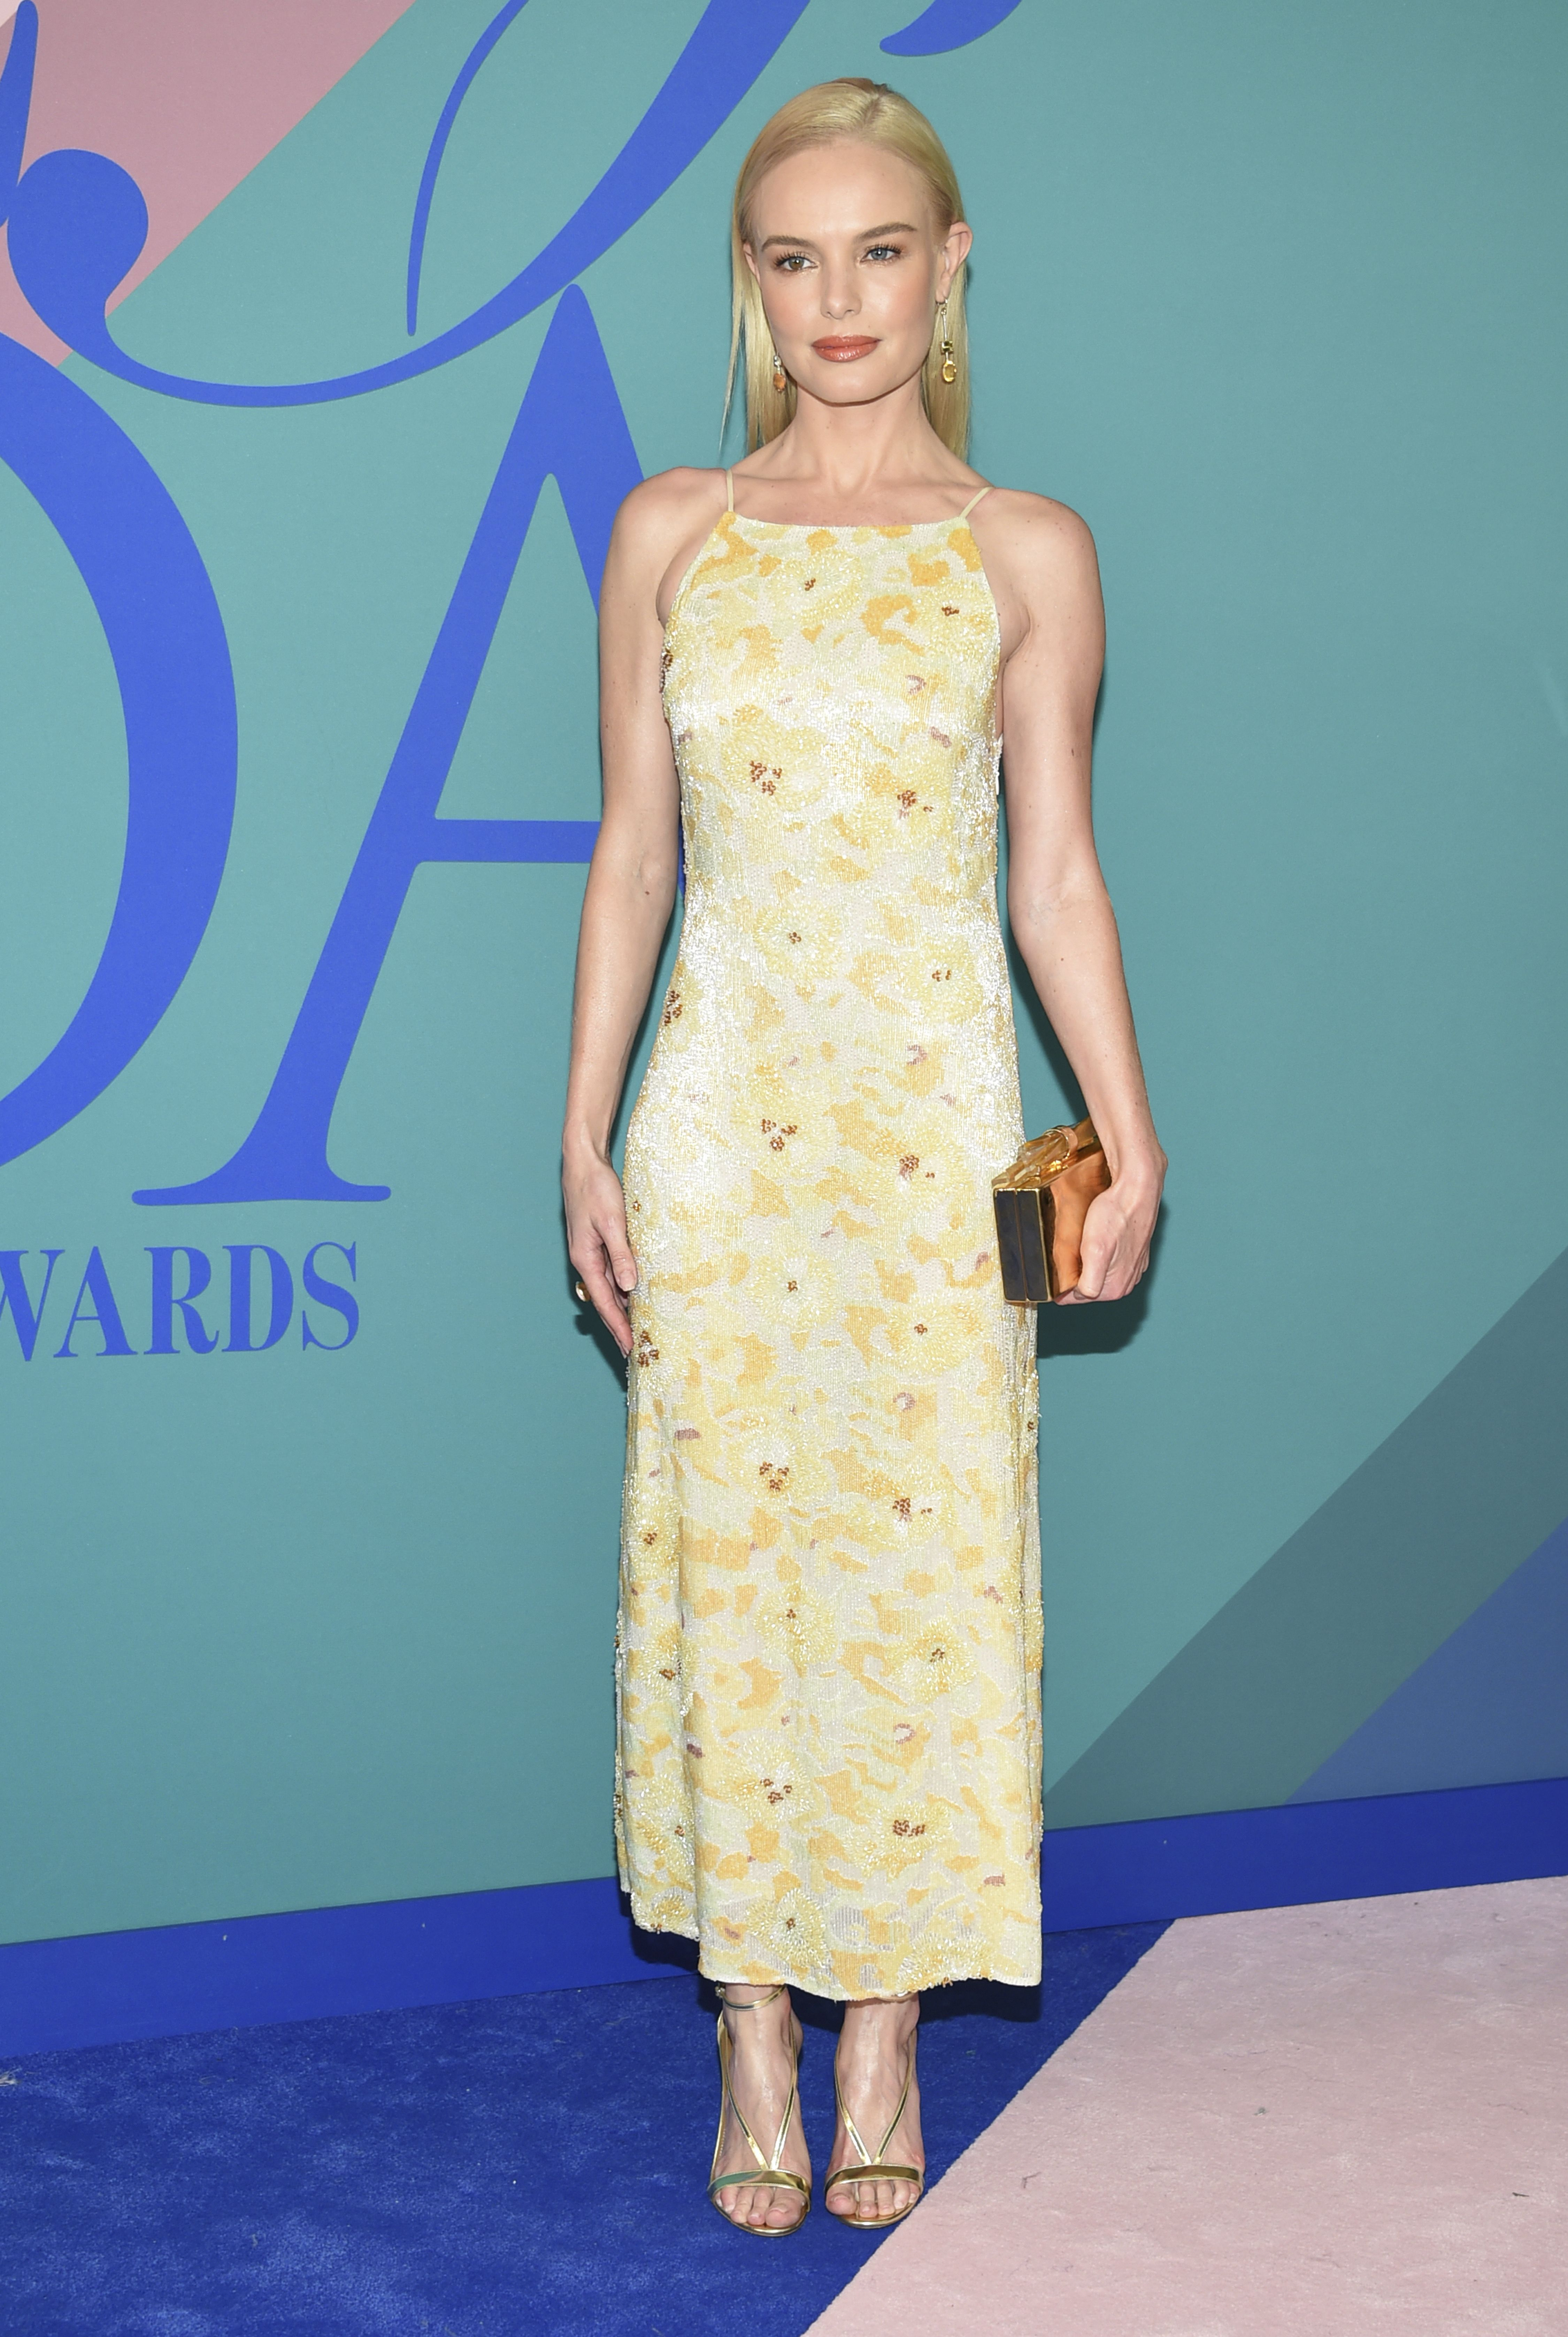 Kate bosworth cfda fashion awards in new york new foto